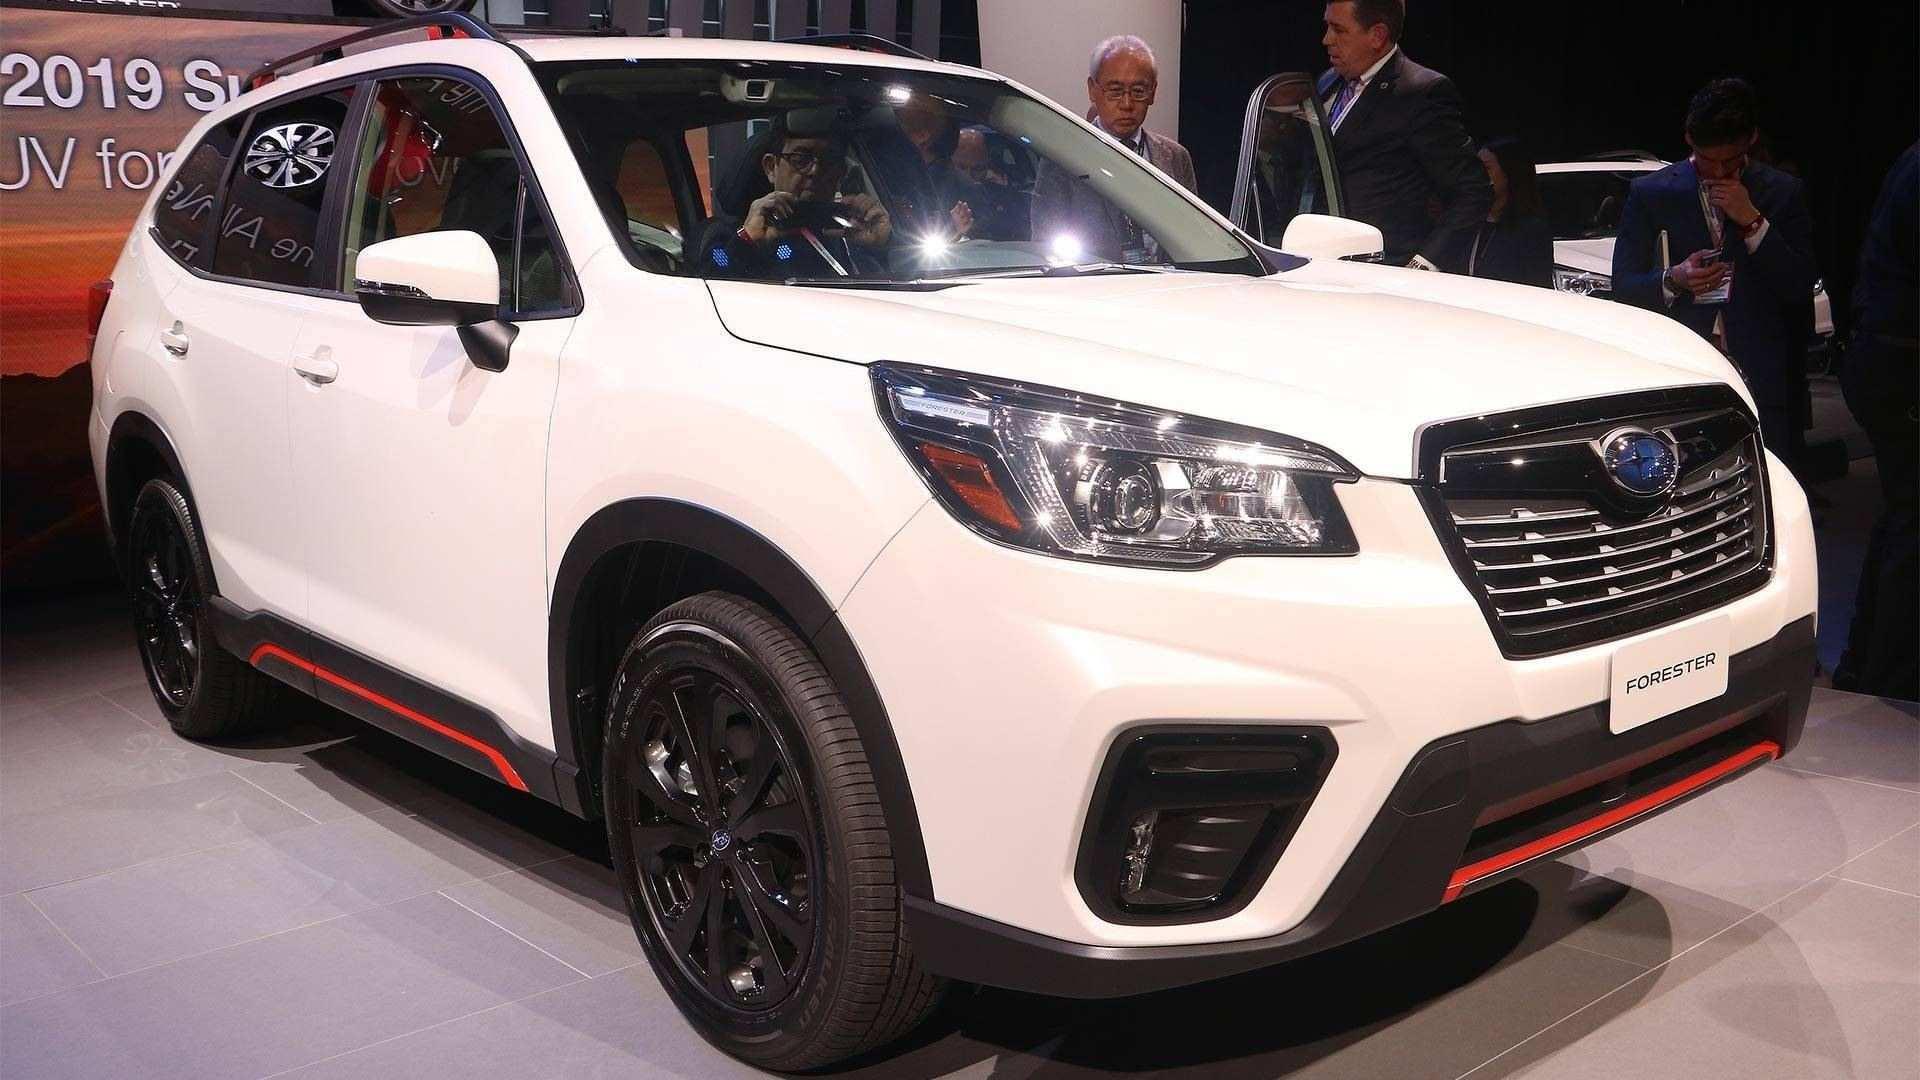 76 Concept of 2020 Subaru Towing Capacity Rumors for 2020 Subaru Towing Capacity